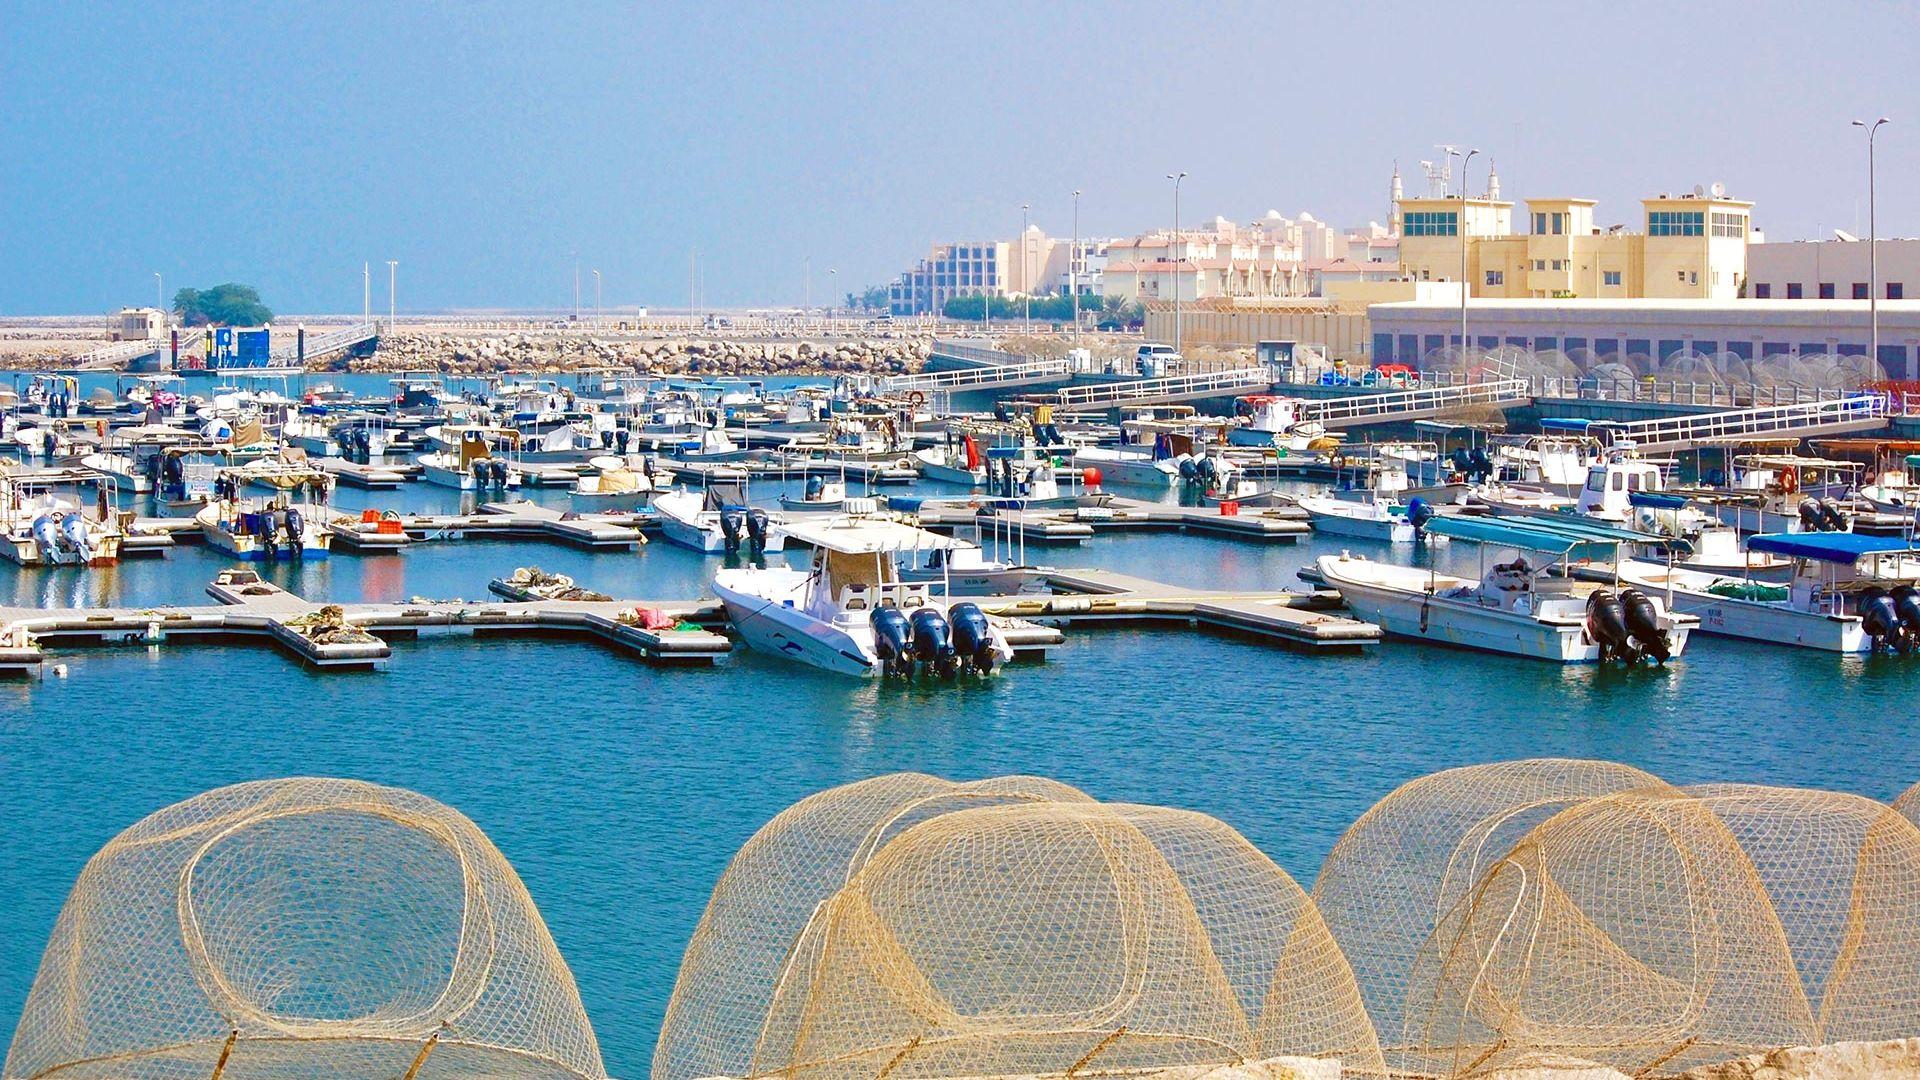 Sejur charter Ras Al Khaima & Dubai, EAU, 8 zile - ianuarie 2021